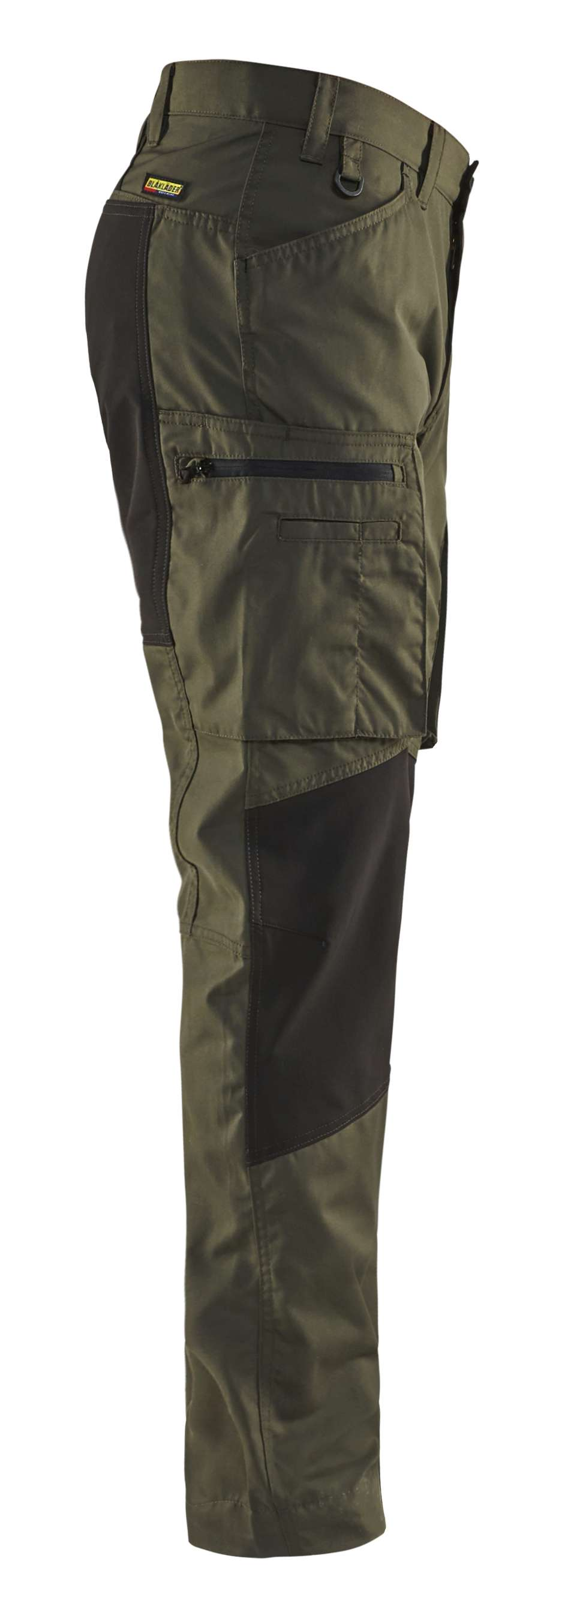 Blaklader Werkbroeken 14591845 met Stretch groen-zwart(4599)